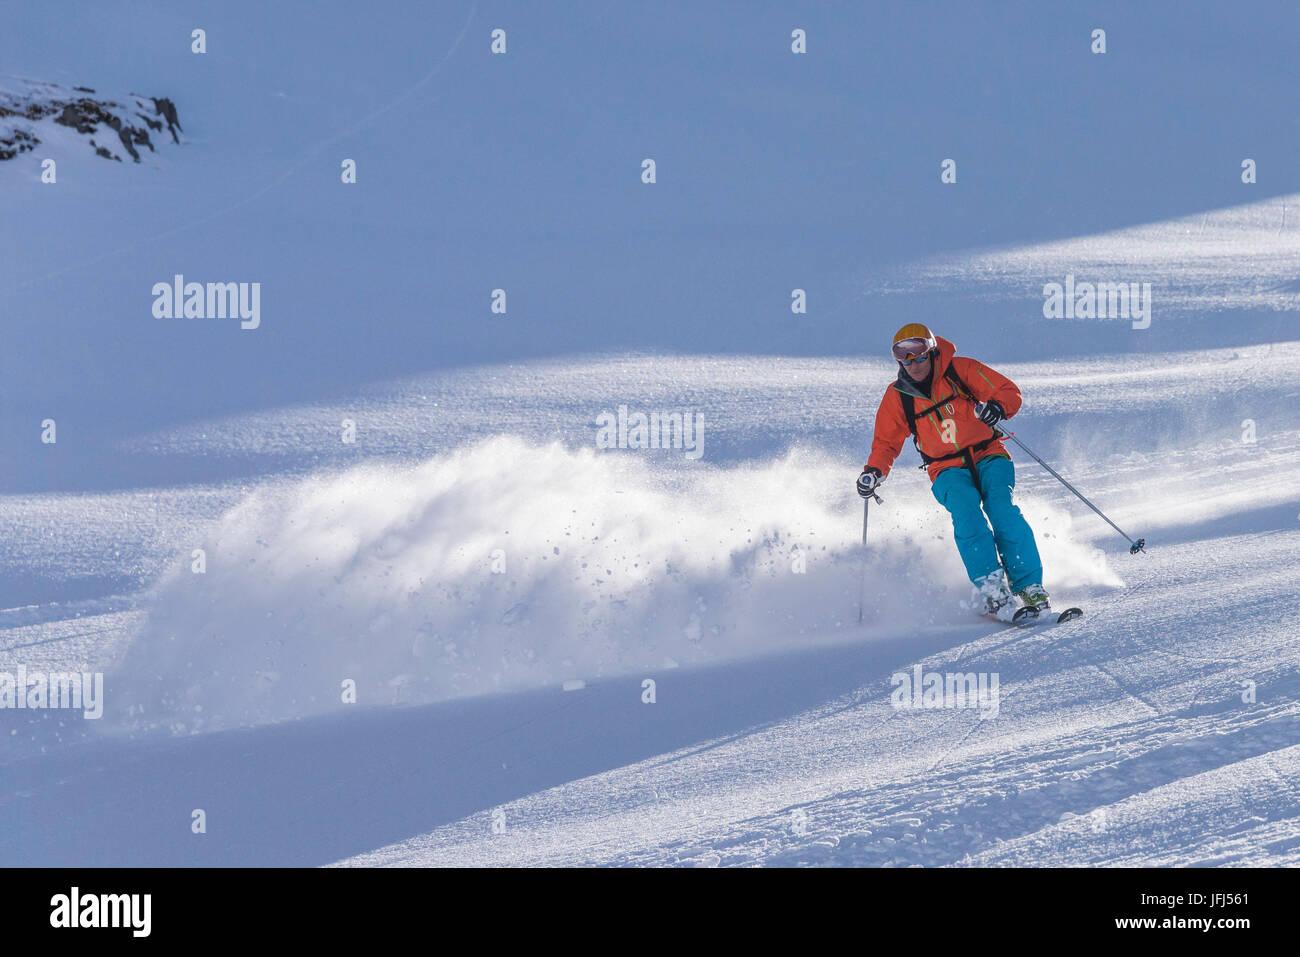 Iceland, Akureyri, troll peninsula Skioadalur, Klaengsholle lodge, Arctic Heli Skiing with Bergmenn Mountain guides - Stock Image